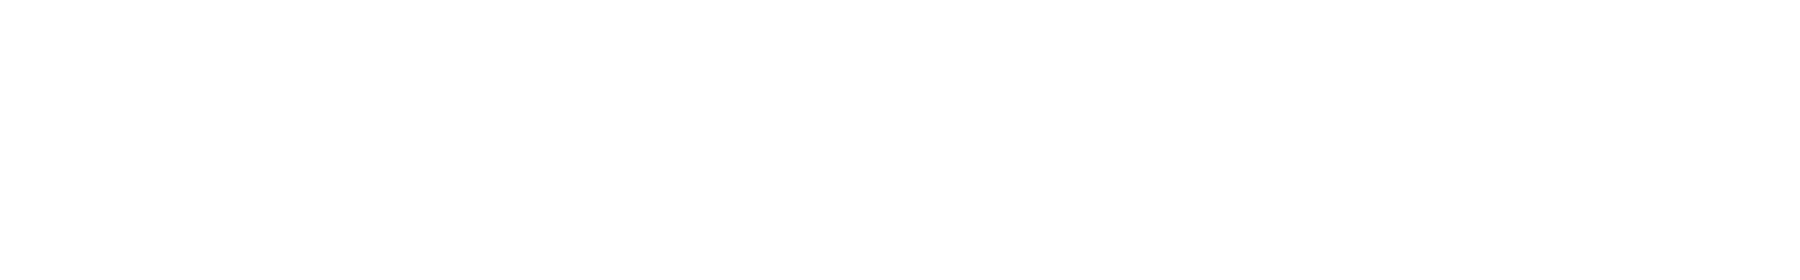 sh 1012